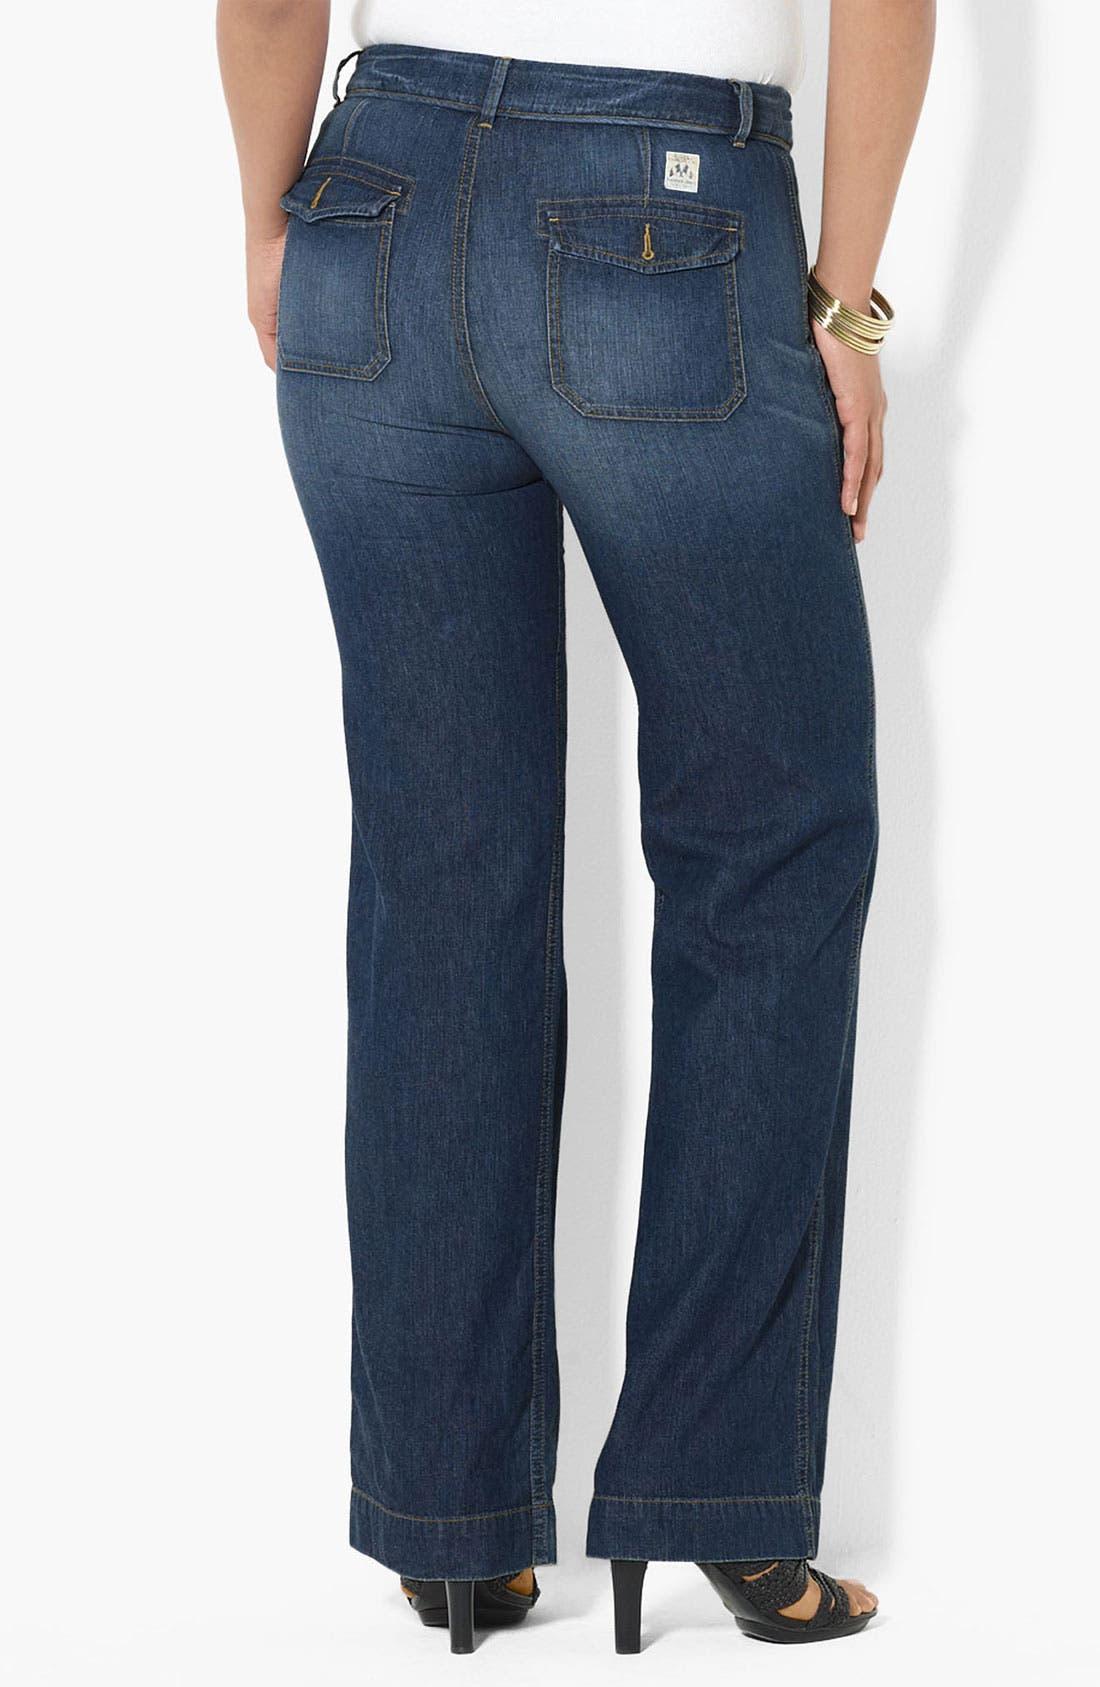 Alternate Image 1 Selected - Lauren Ralph Lauren Drawstring Waist Jeans (Plus)